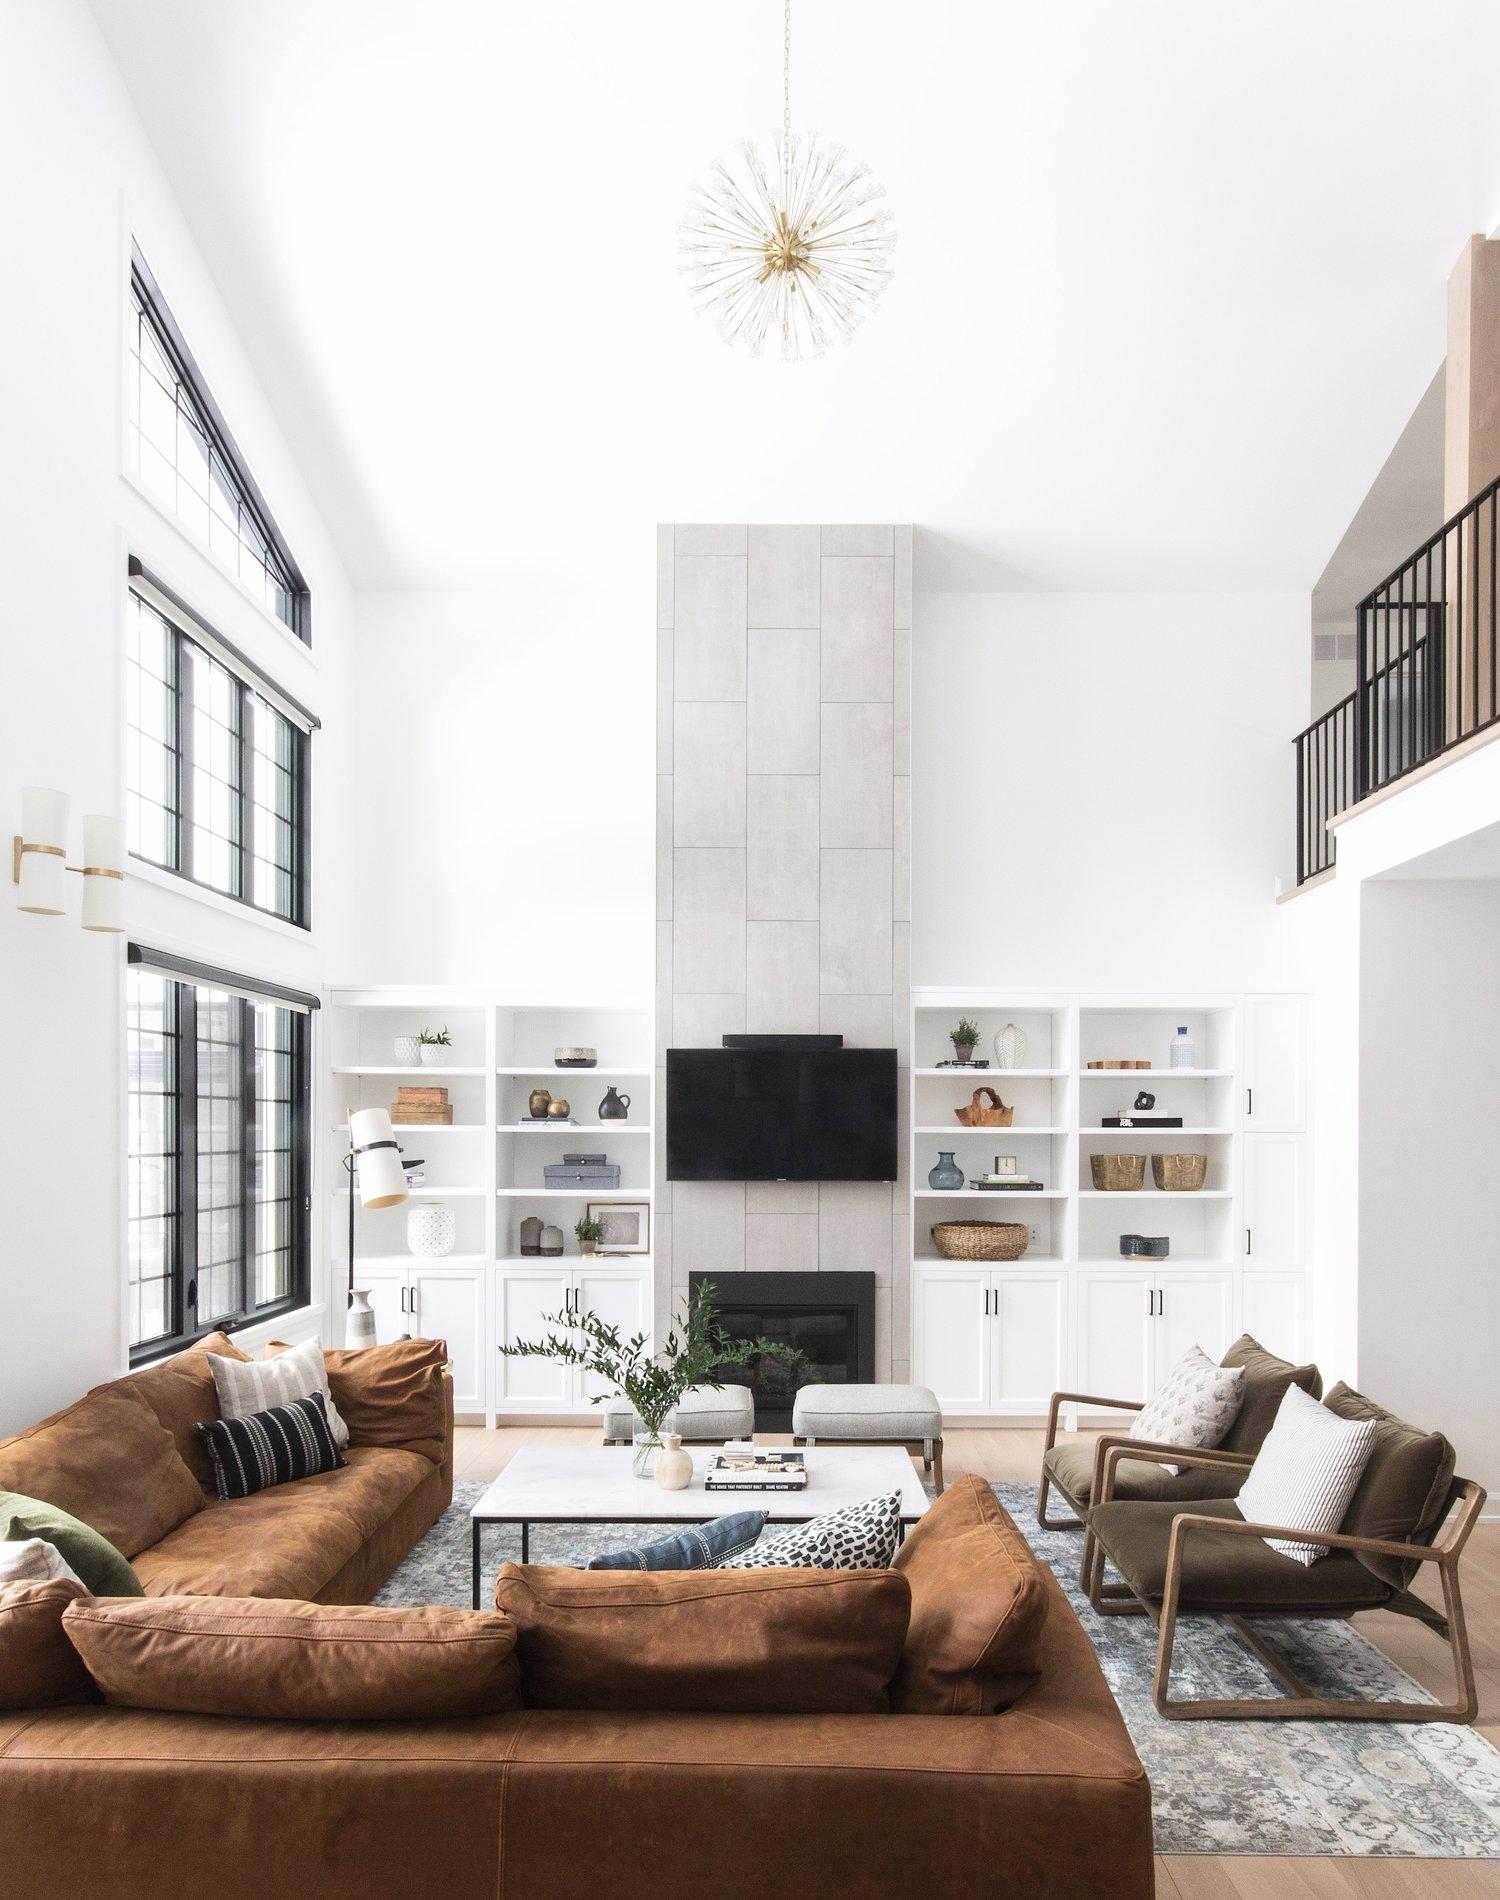 Inviting modern home design by Ottawa Interior Design Firm Leclair Decor